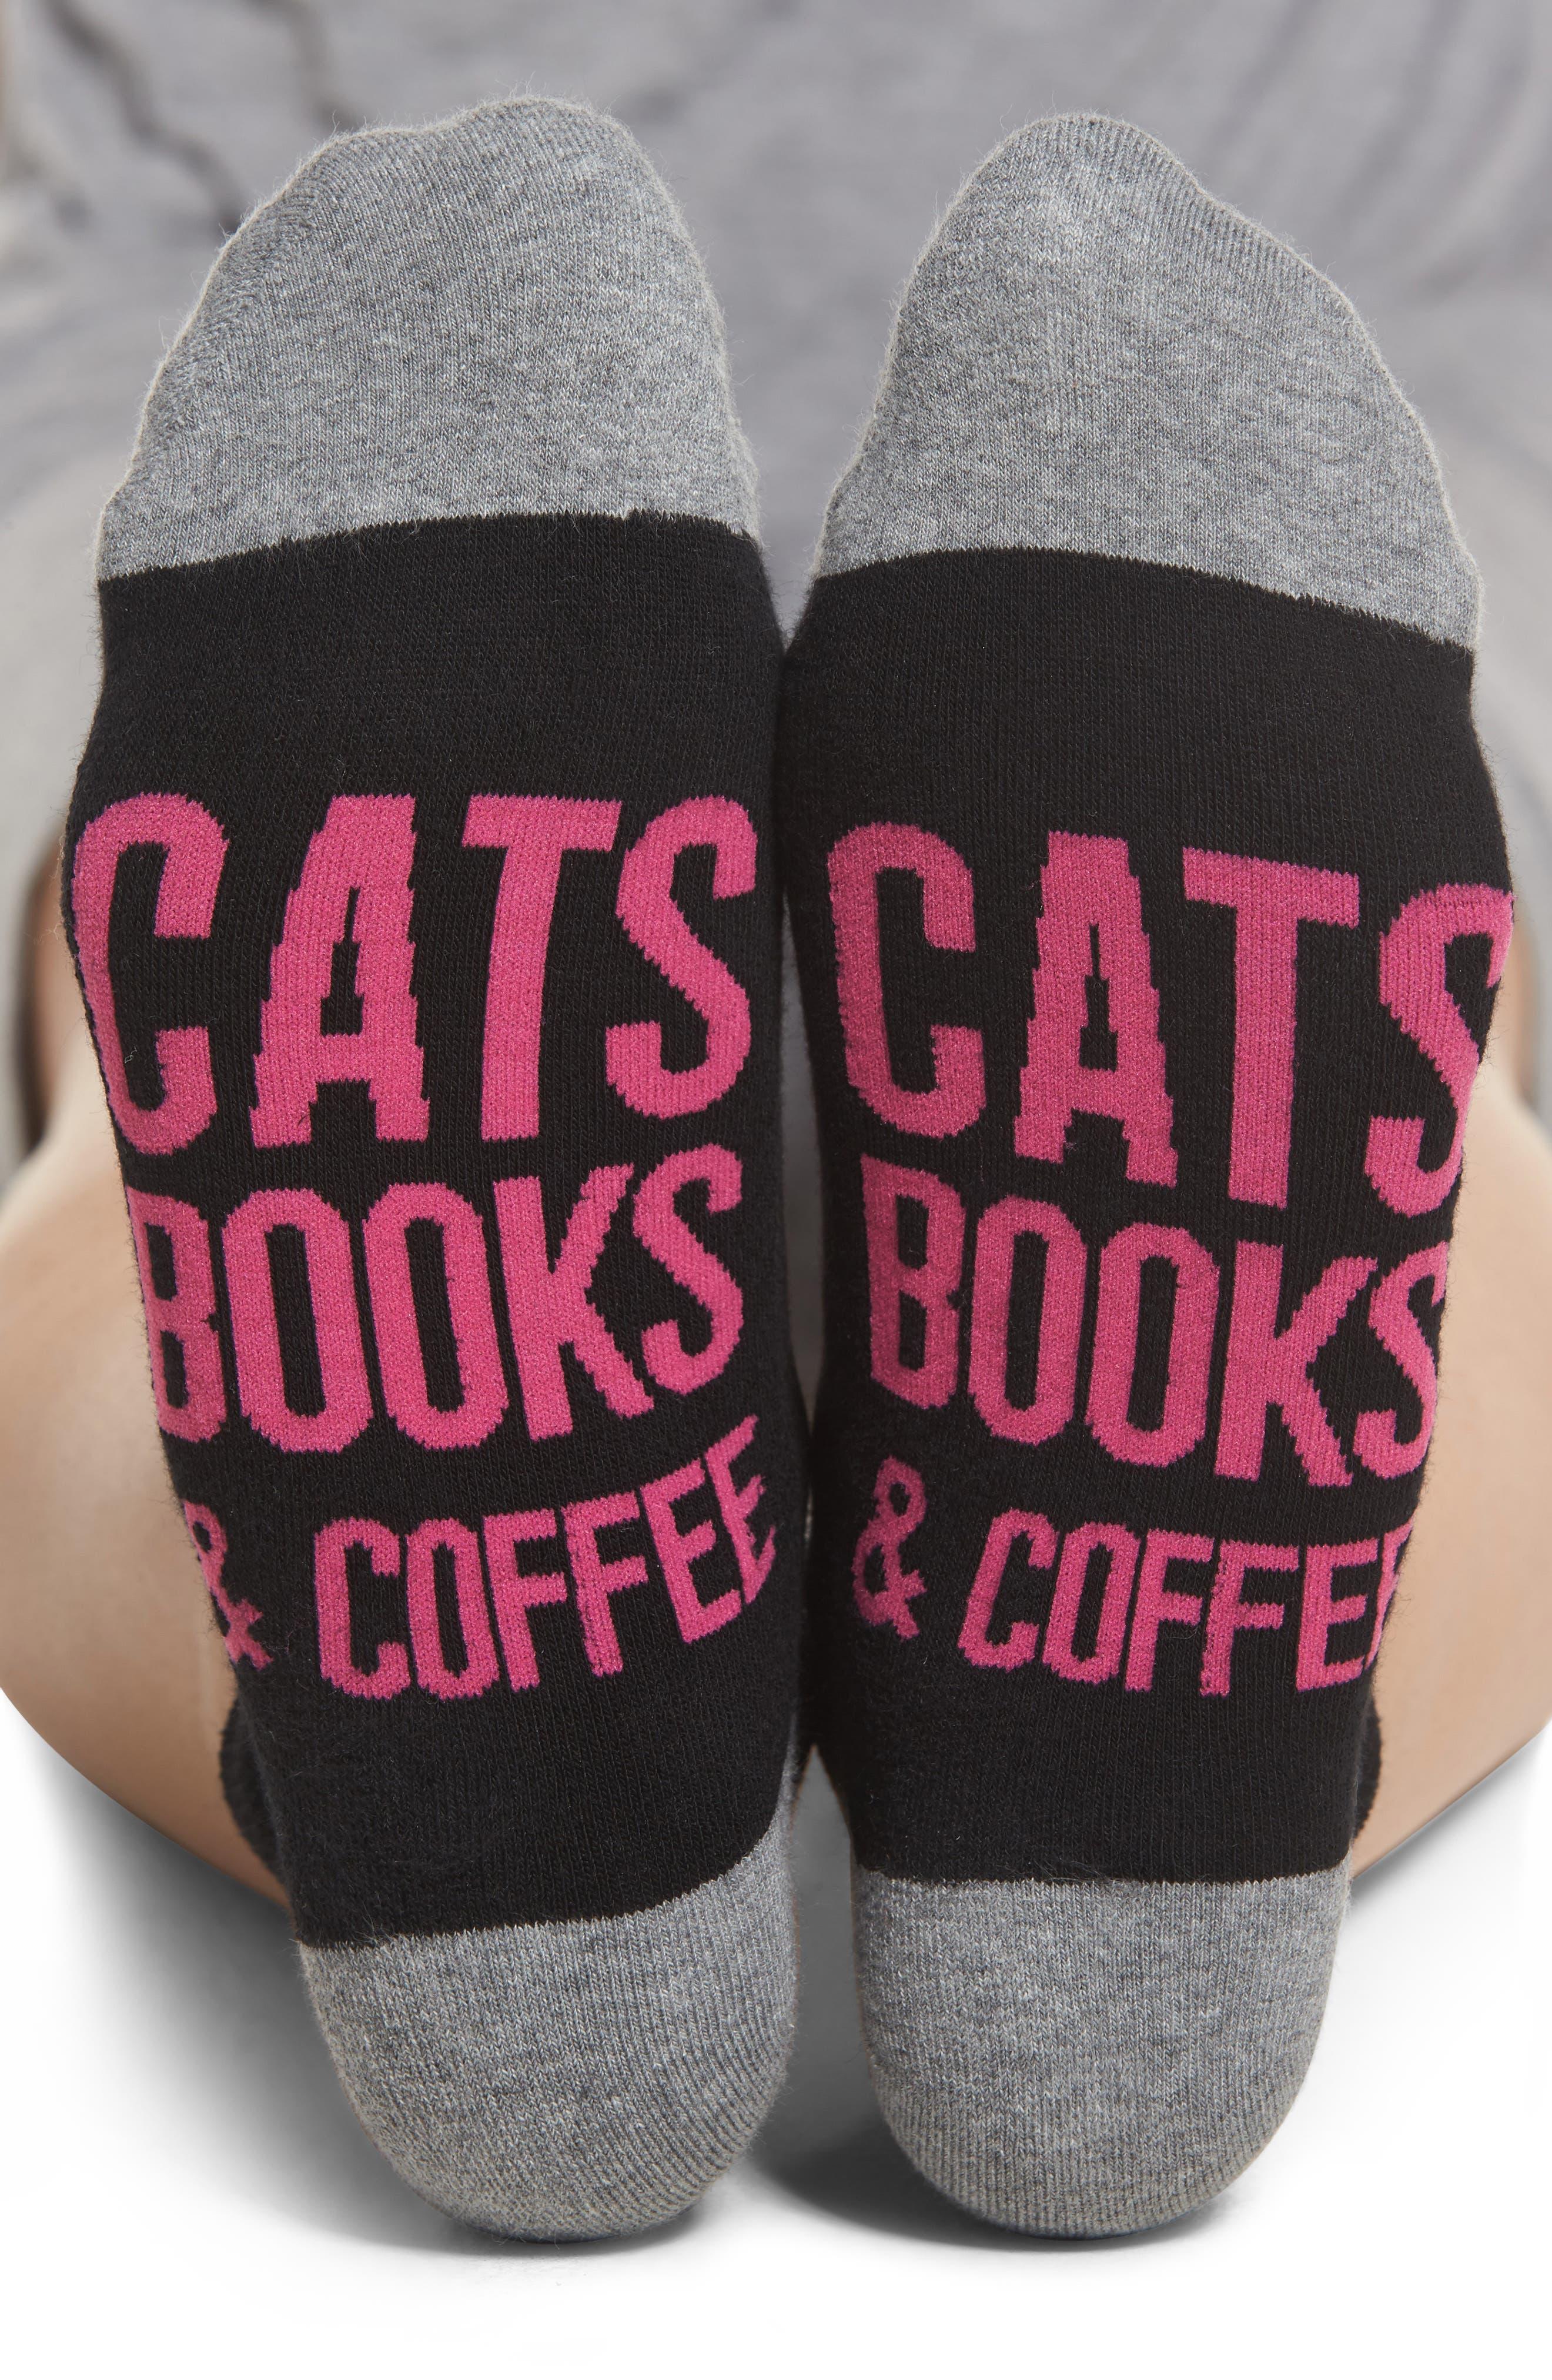 SOCKART Cats, Books & Coffee Ankle Socks